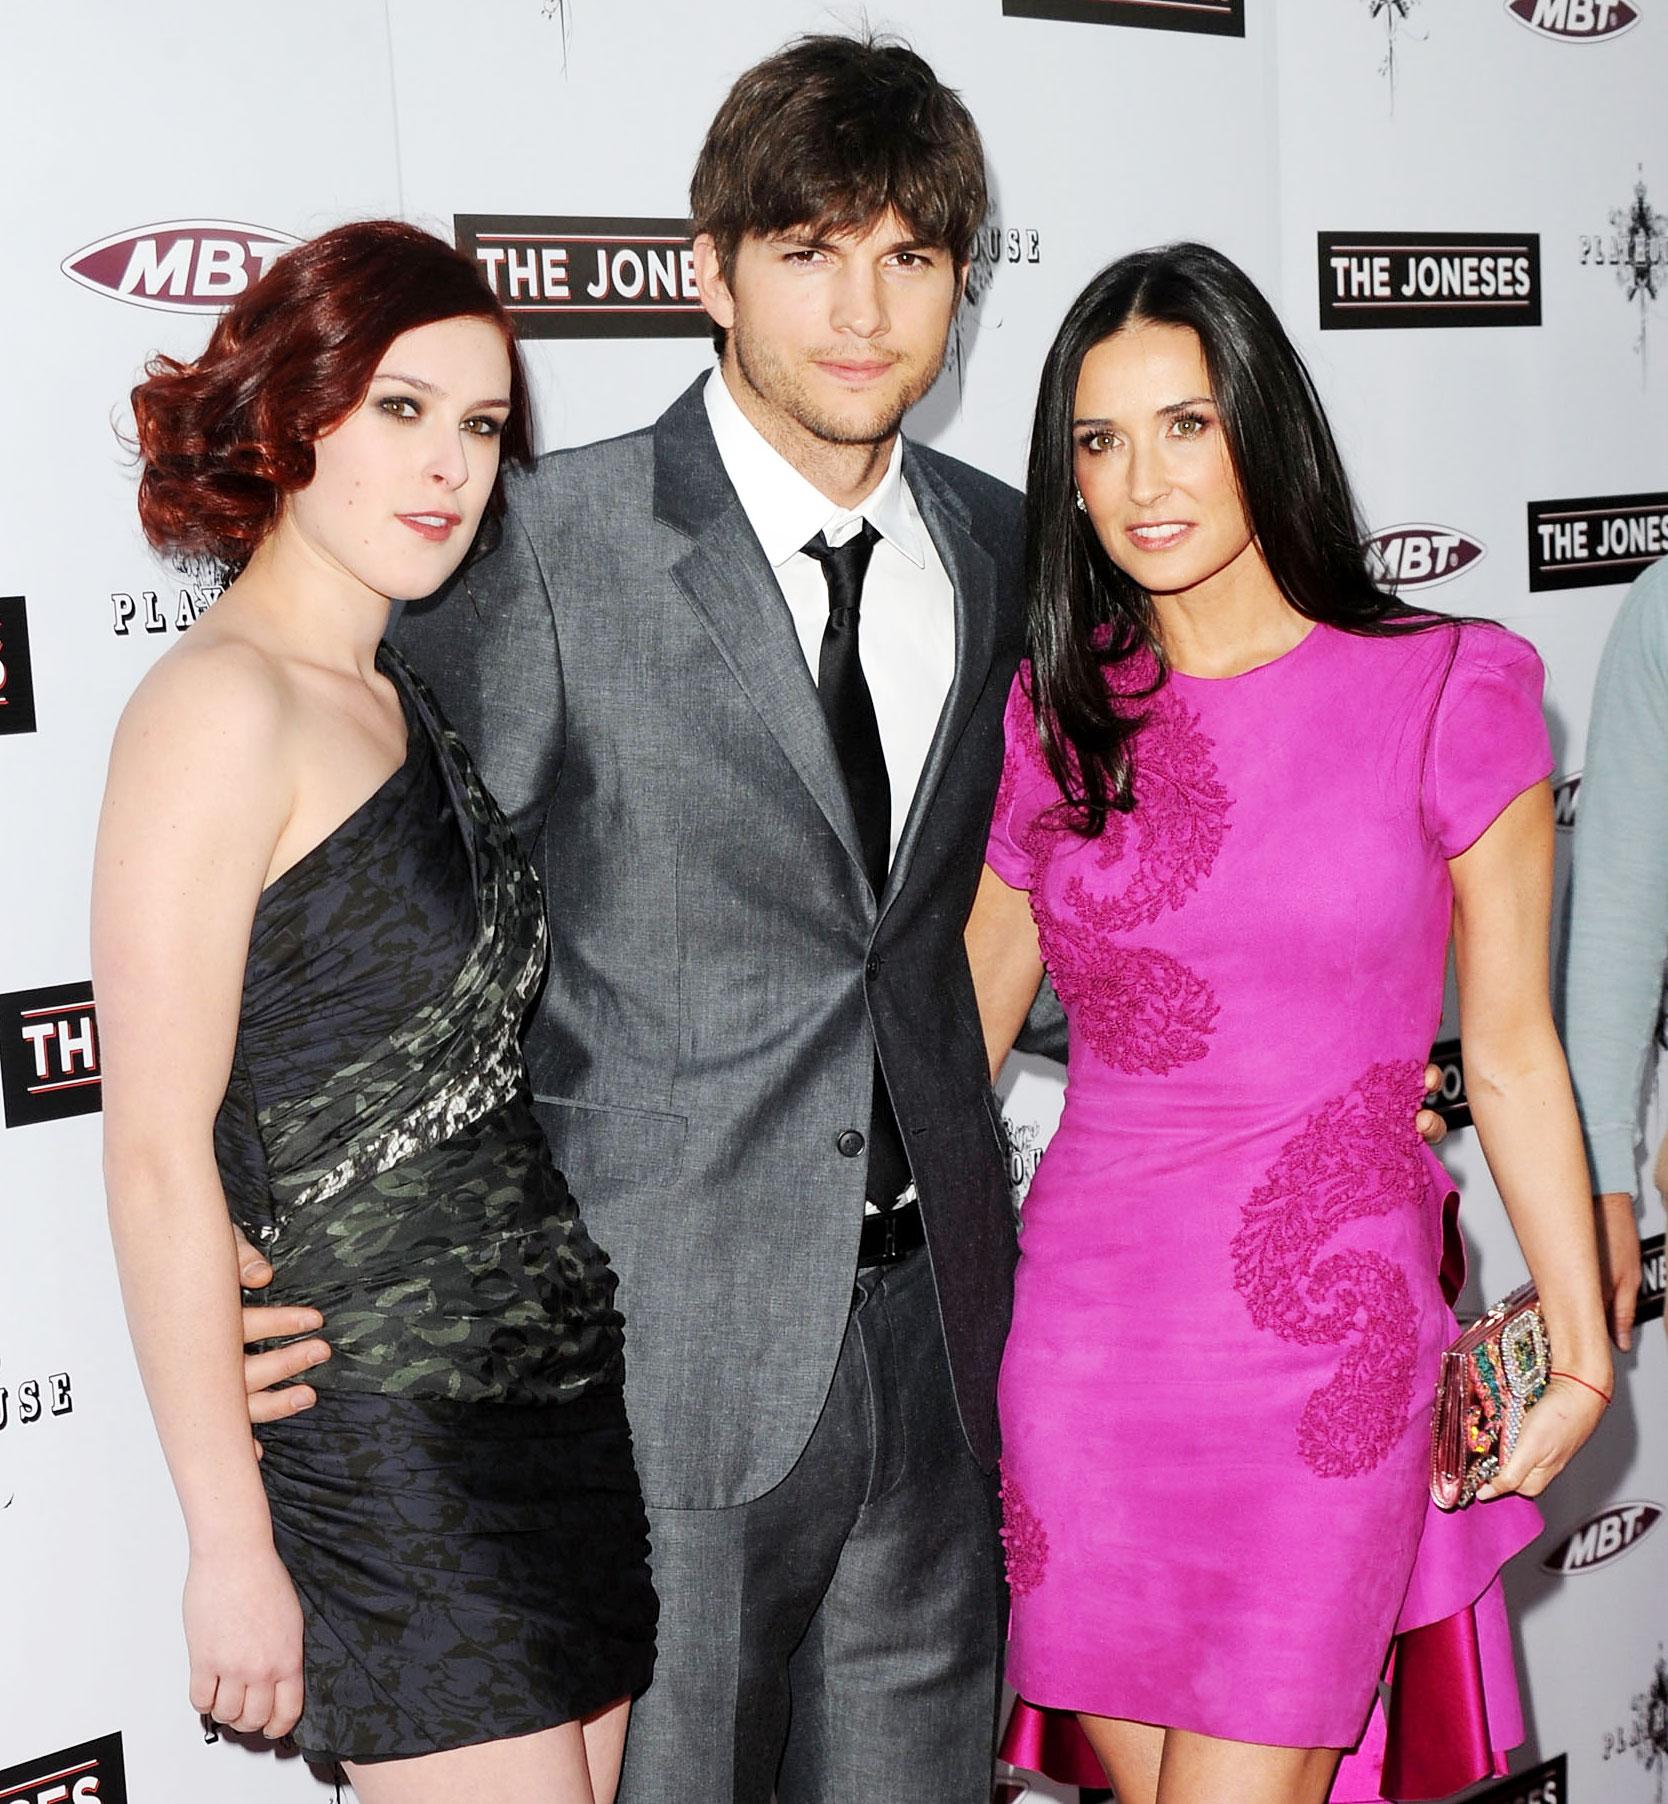 Rumer Willis Ashton Kutcher and Demi Moore at the Premiere of The Joneses